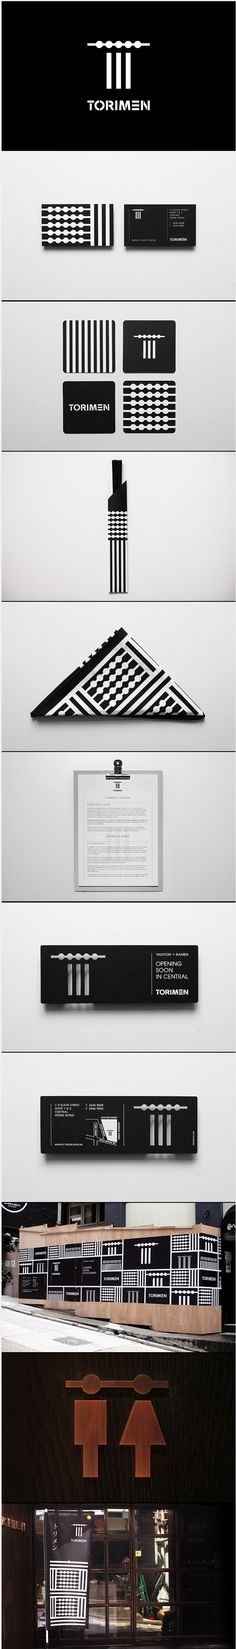 restaurants inspiration / branding | Torimen by Ken Lo